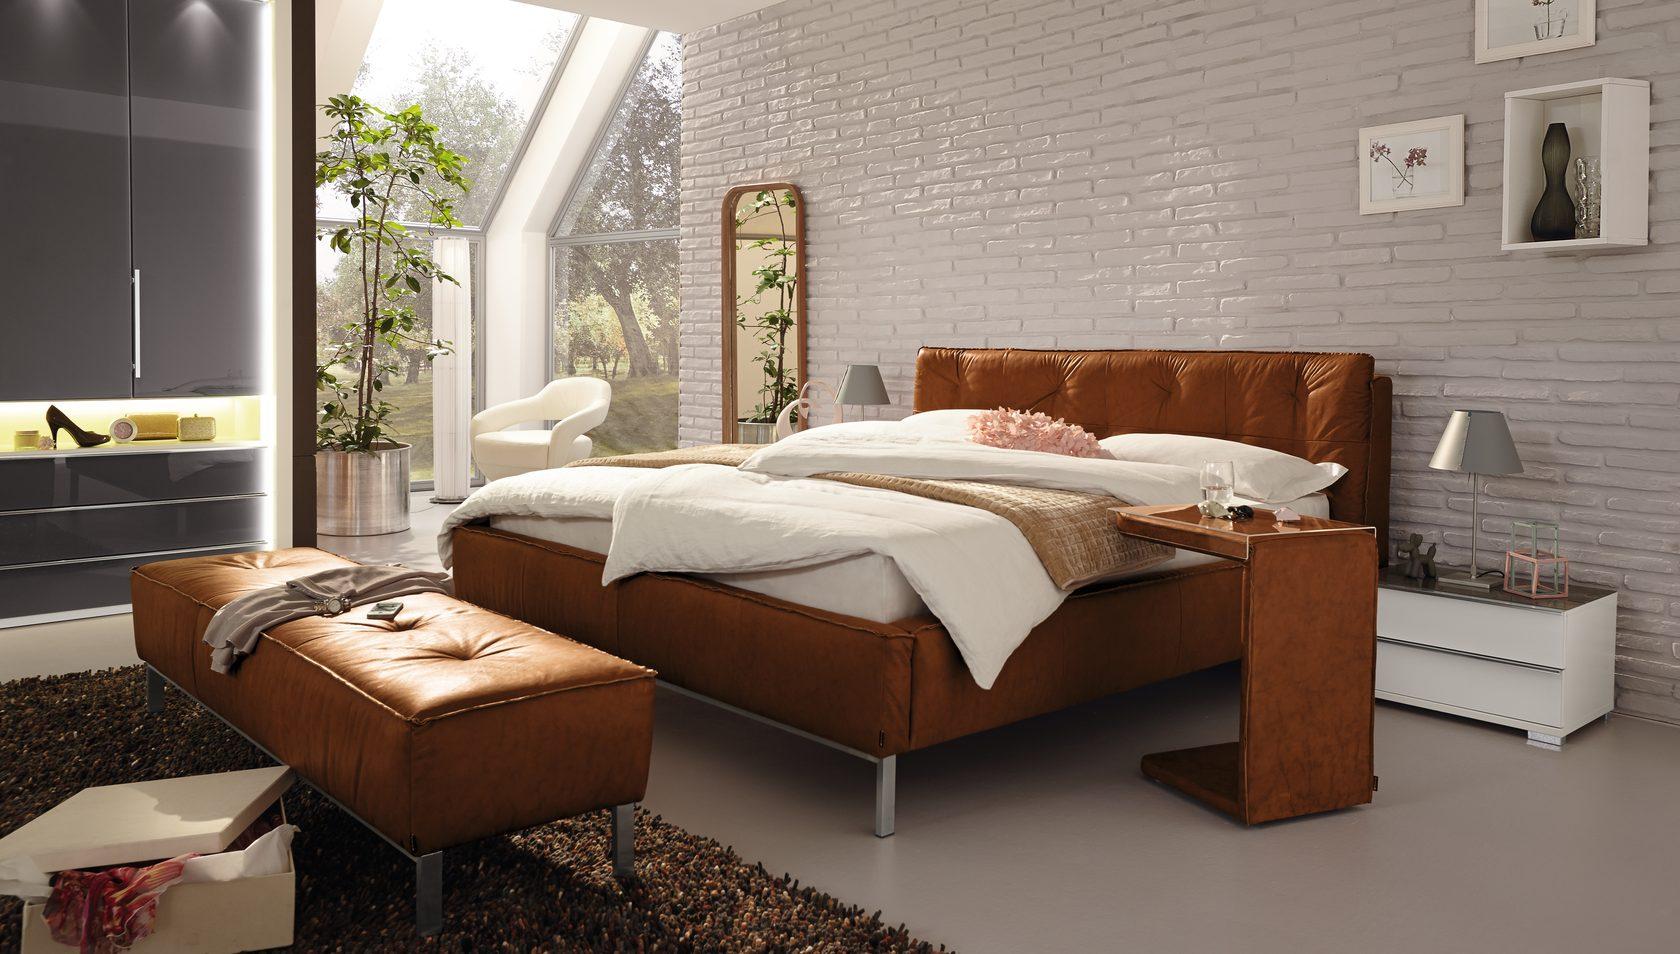 Musterring schlafzimmer sari inspiration for Sari furniture designer